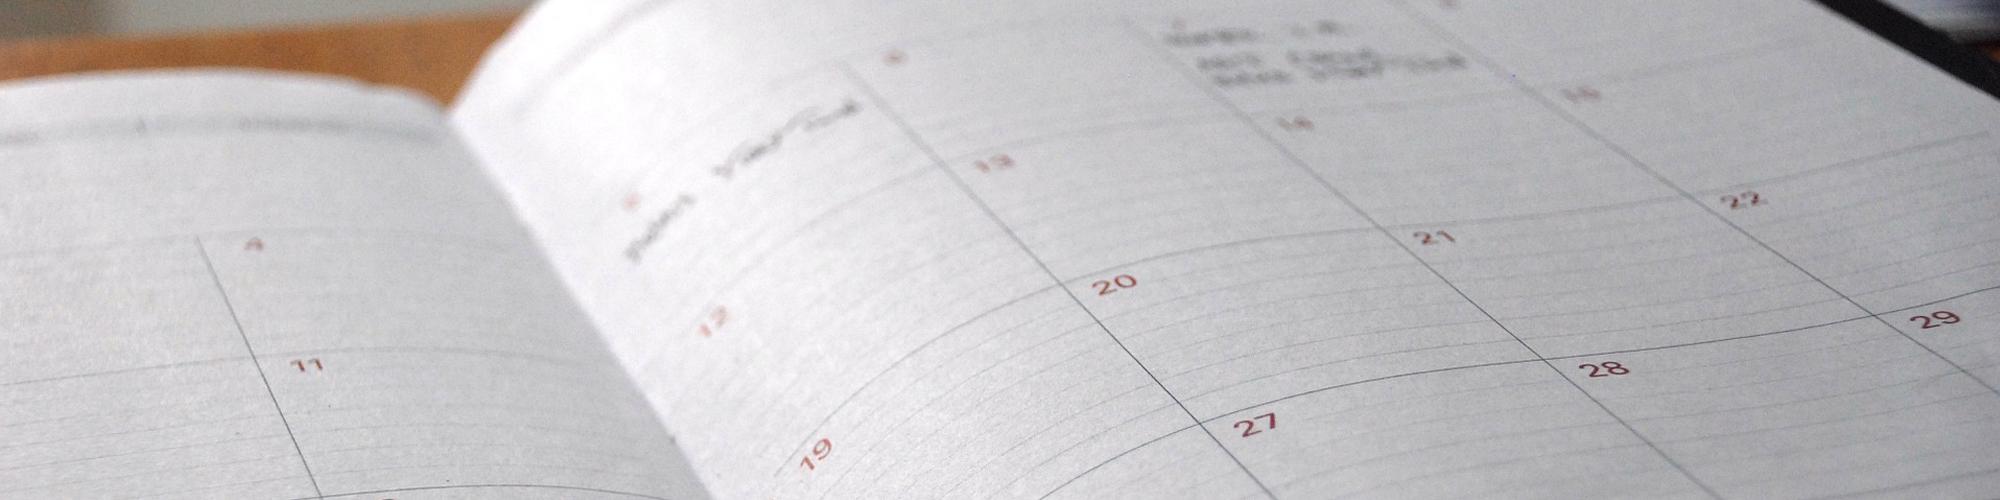 Calendario Traduzione Inglese.Calendario Mediatori Linguistici Matera Mediazione